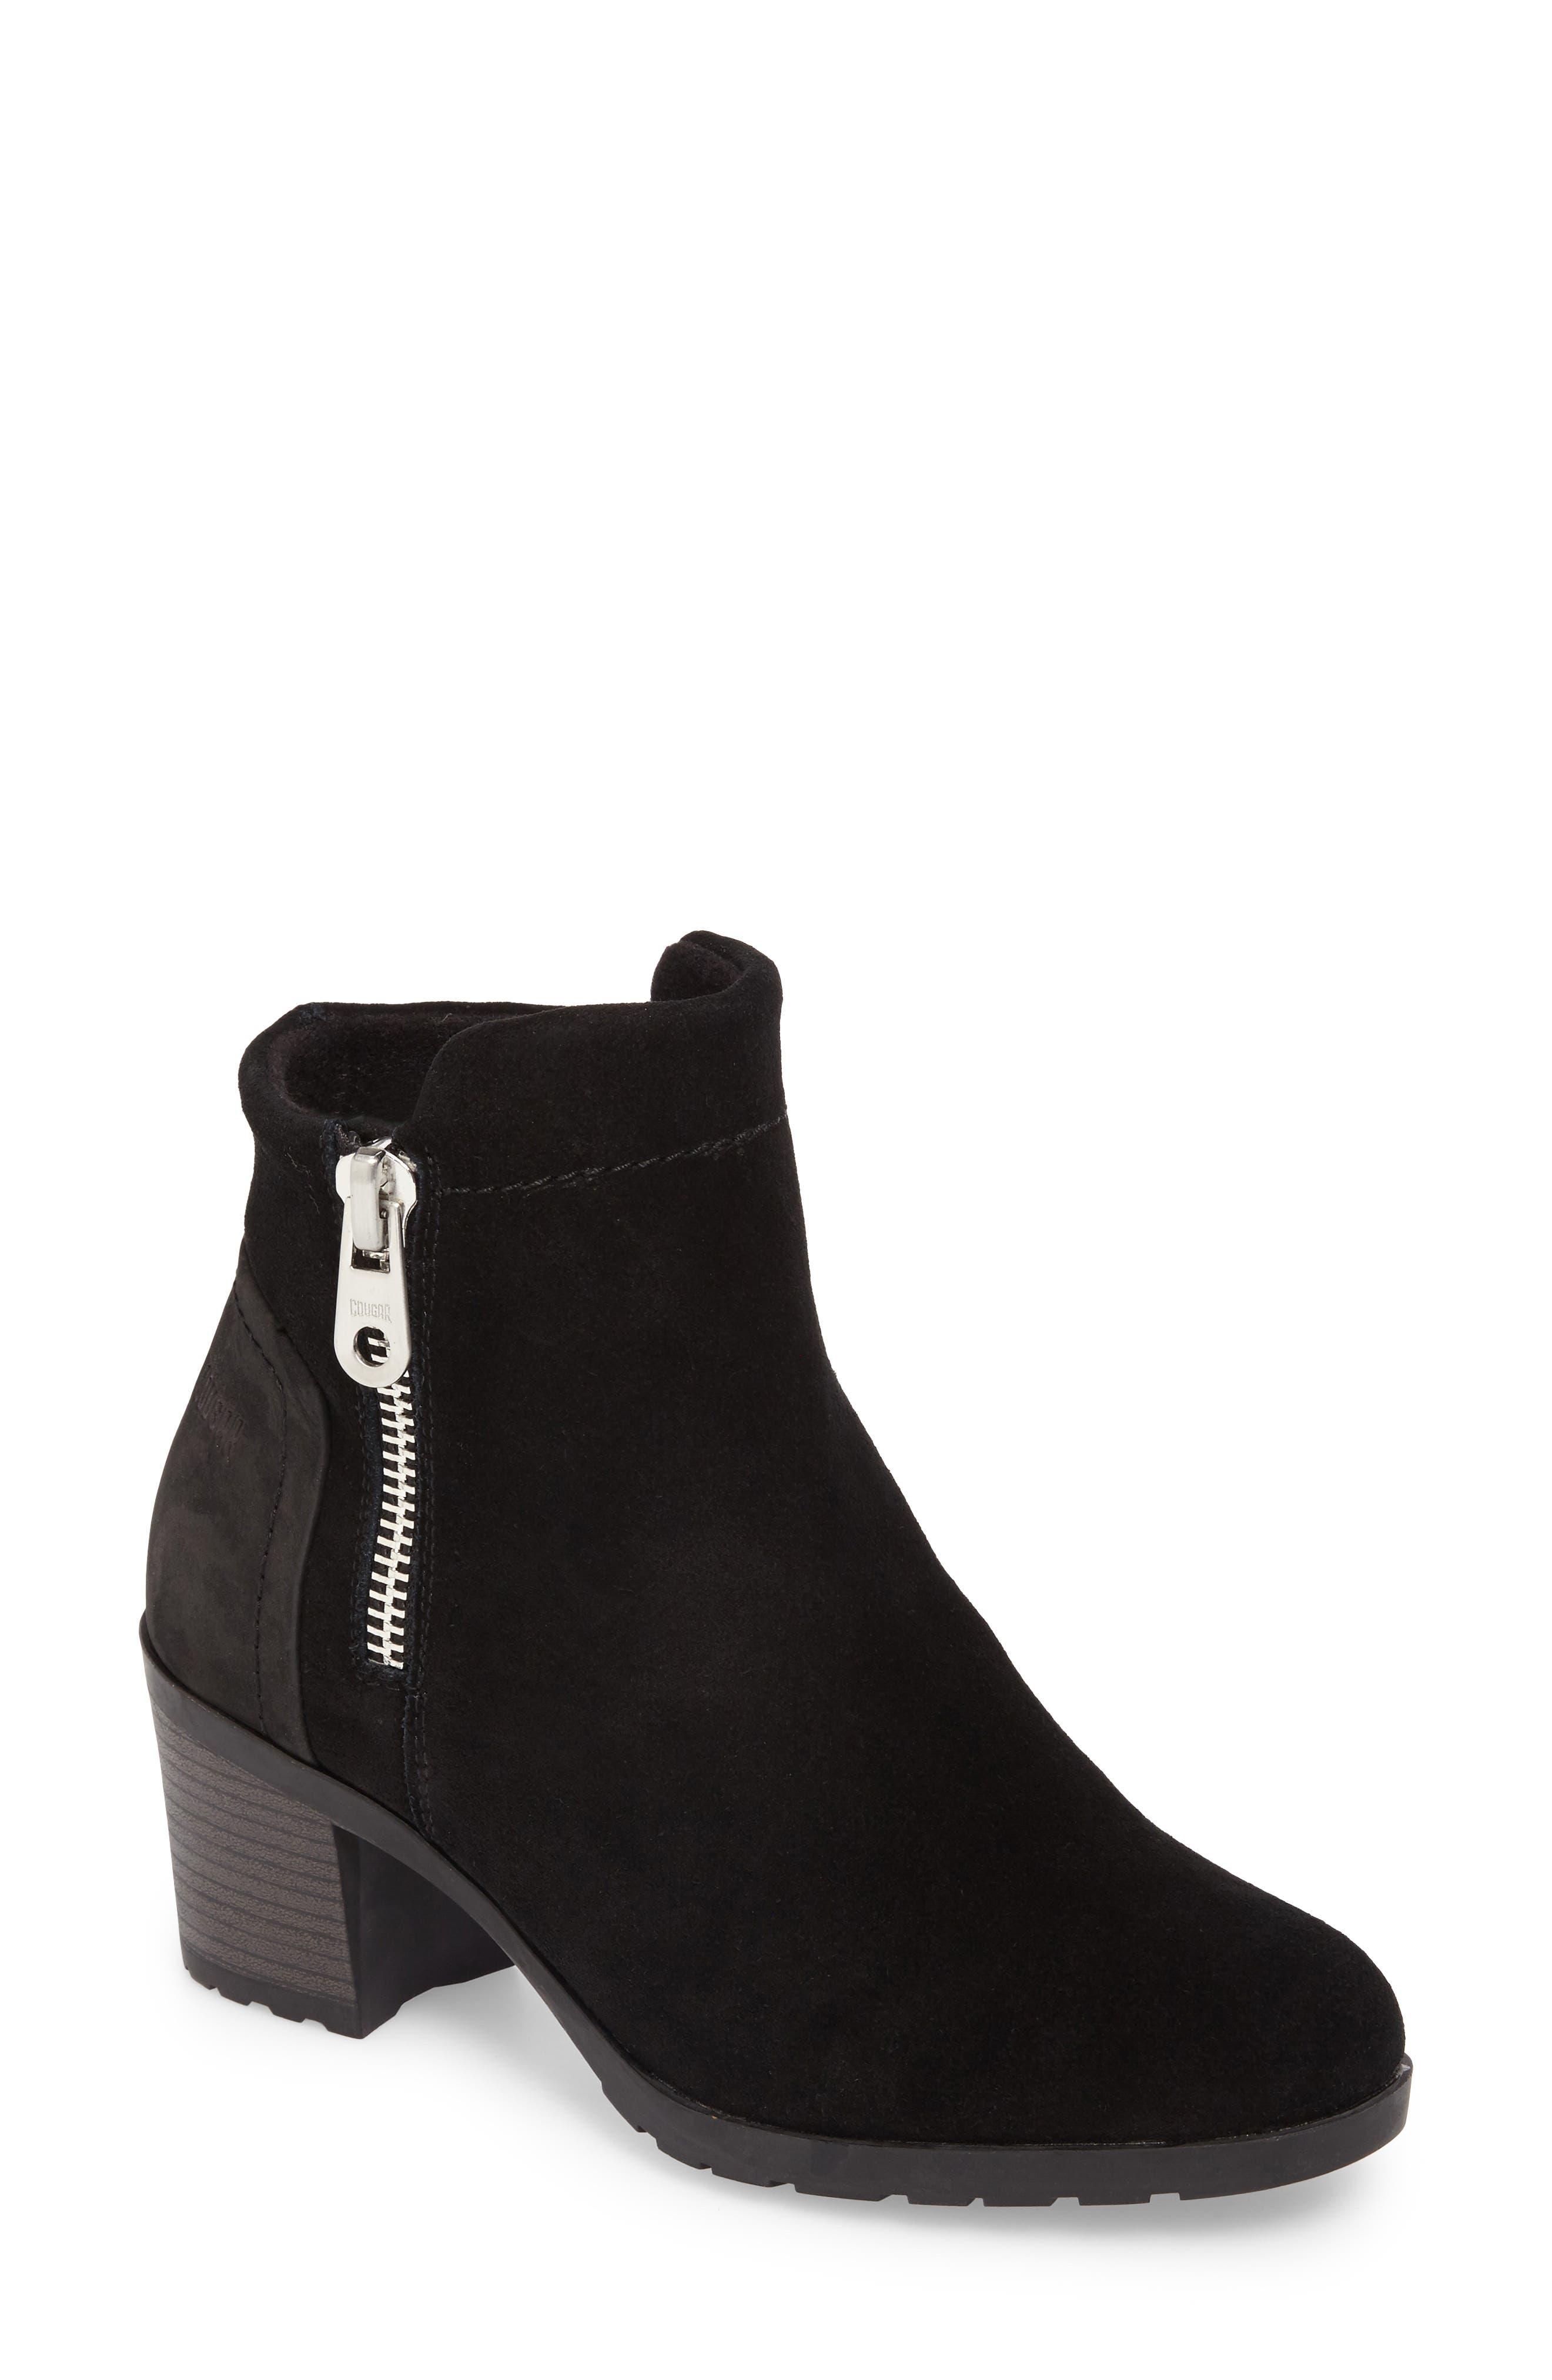 Anton Waterproof Boot,                         Main,                         color, Black Suede